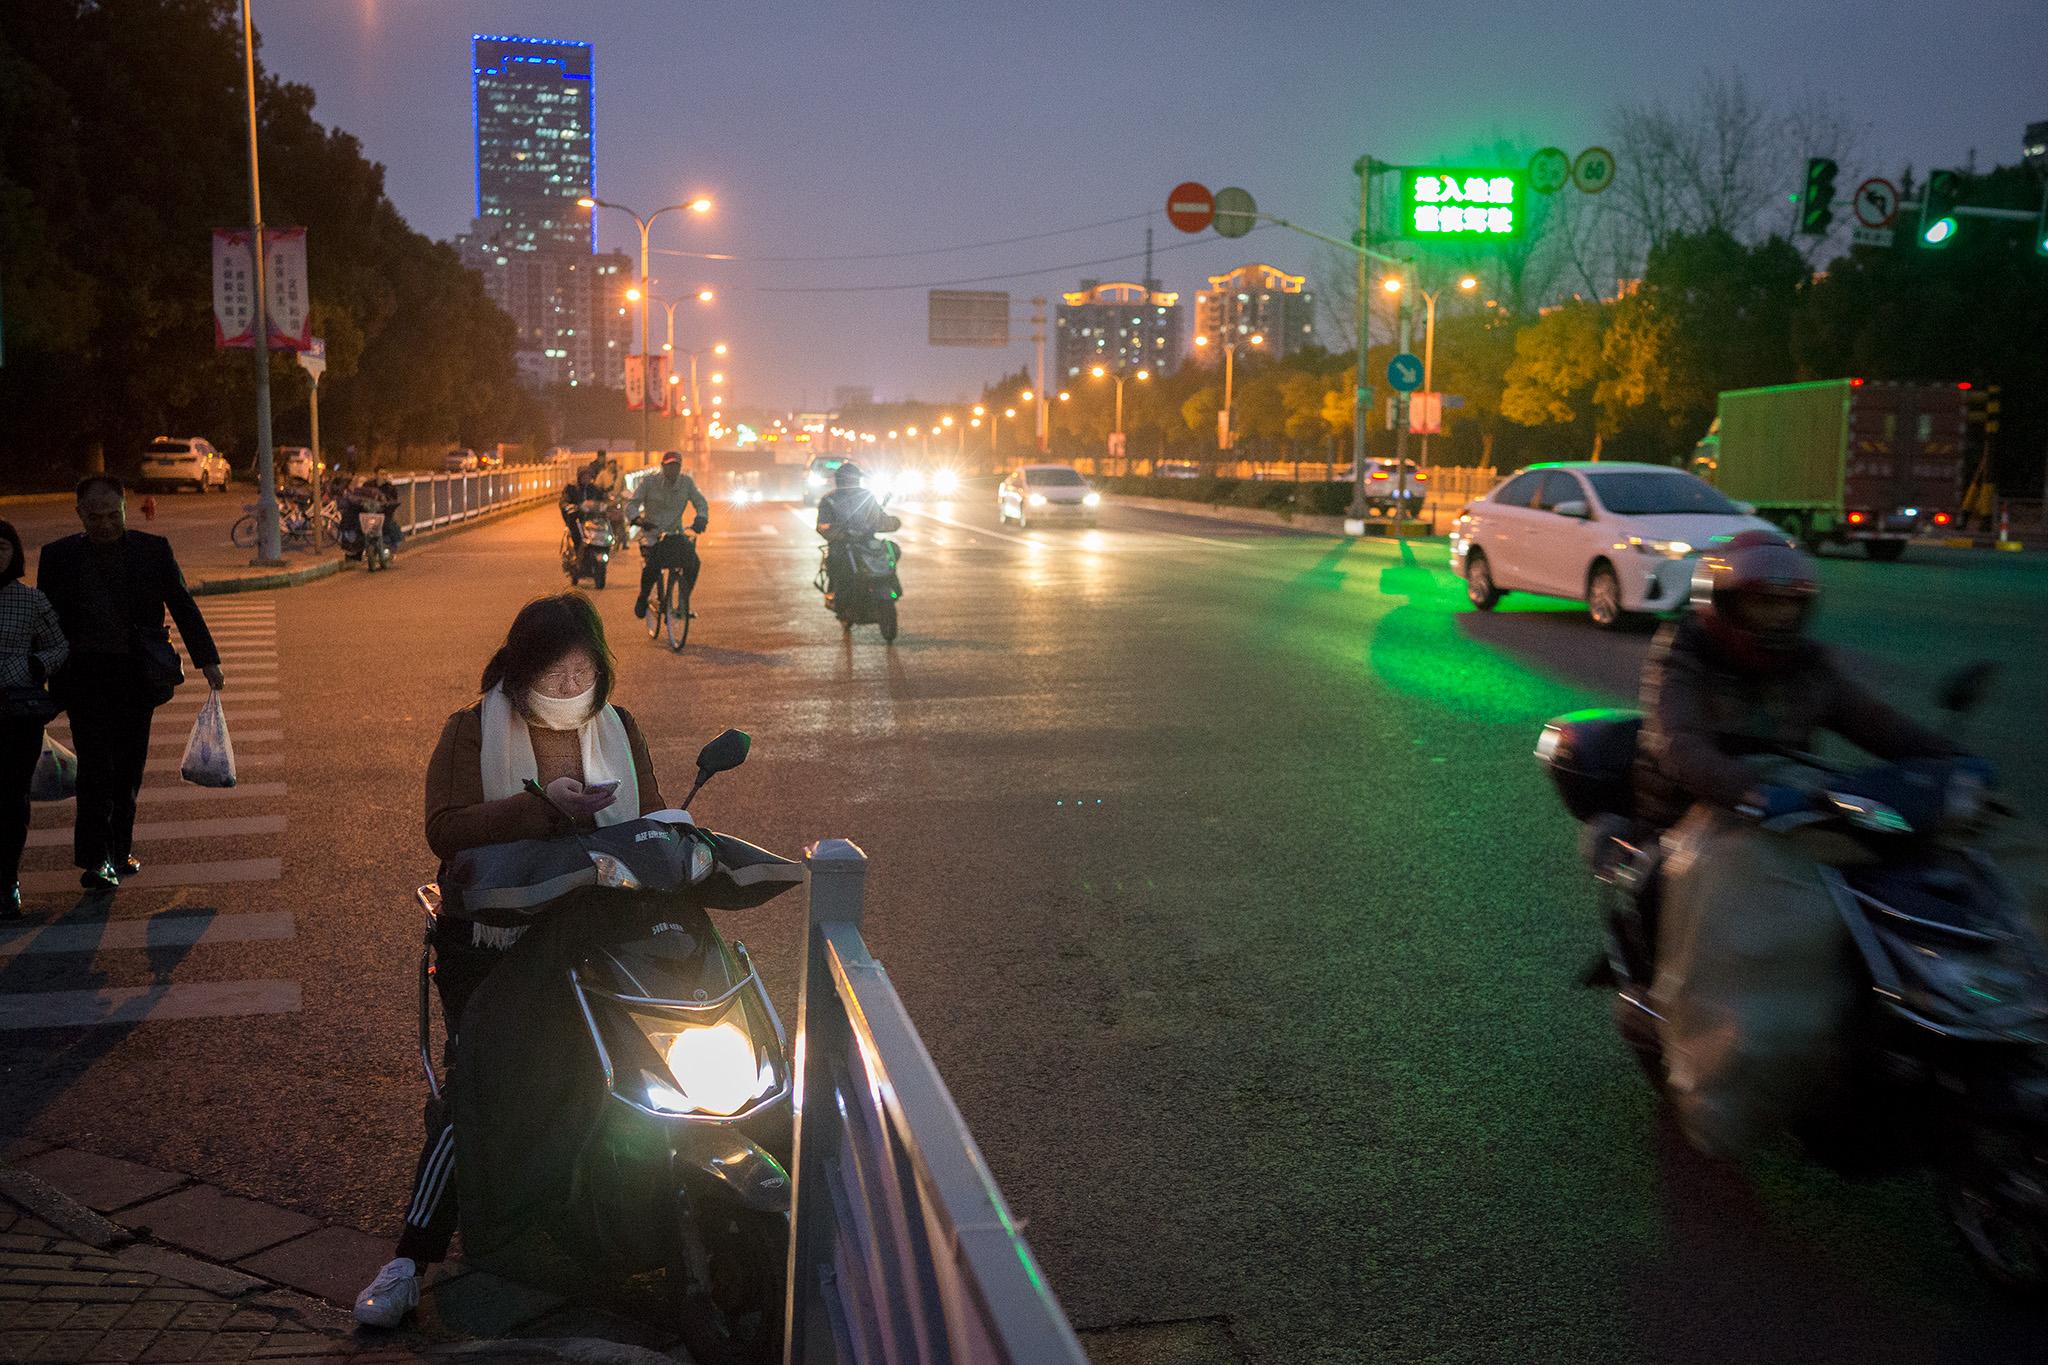 Main road in Xinzhuang, Shanghai